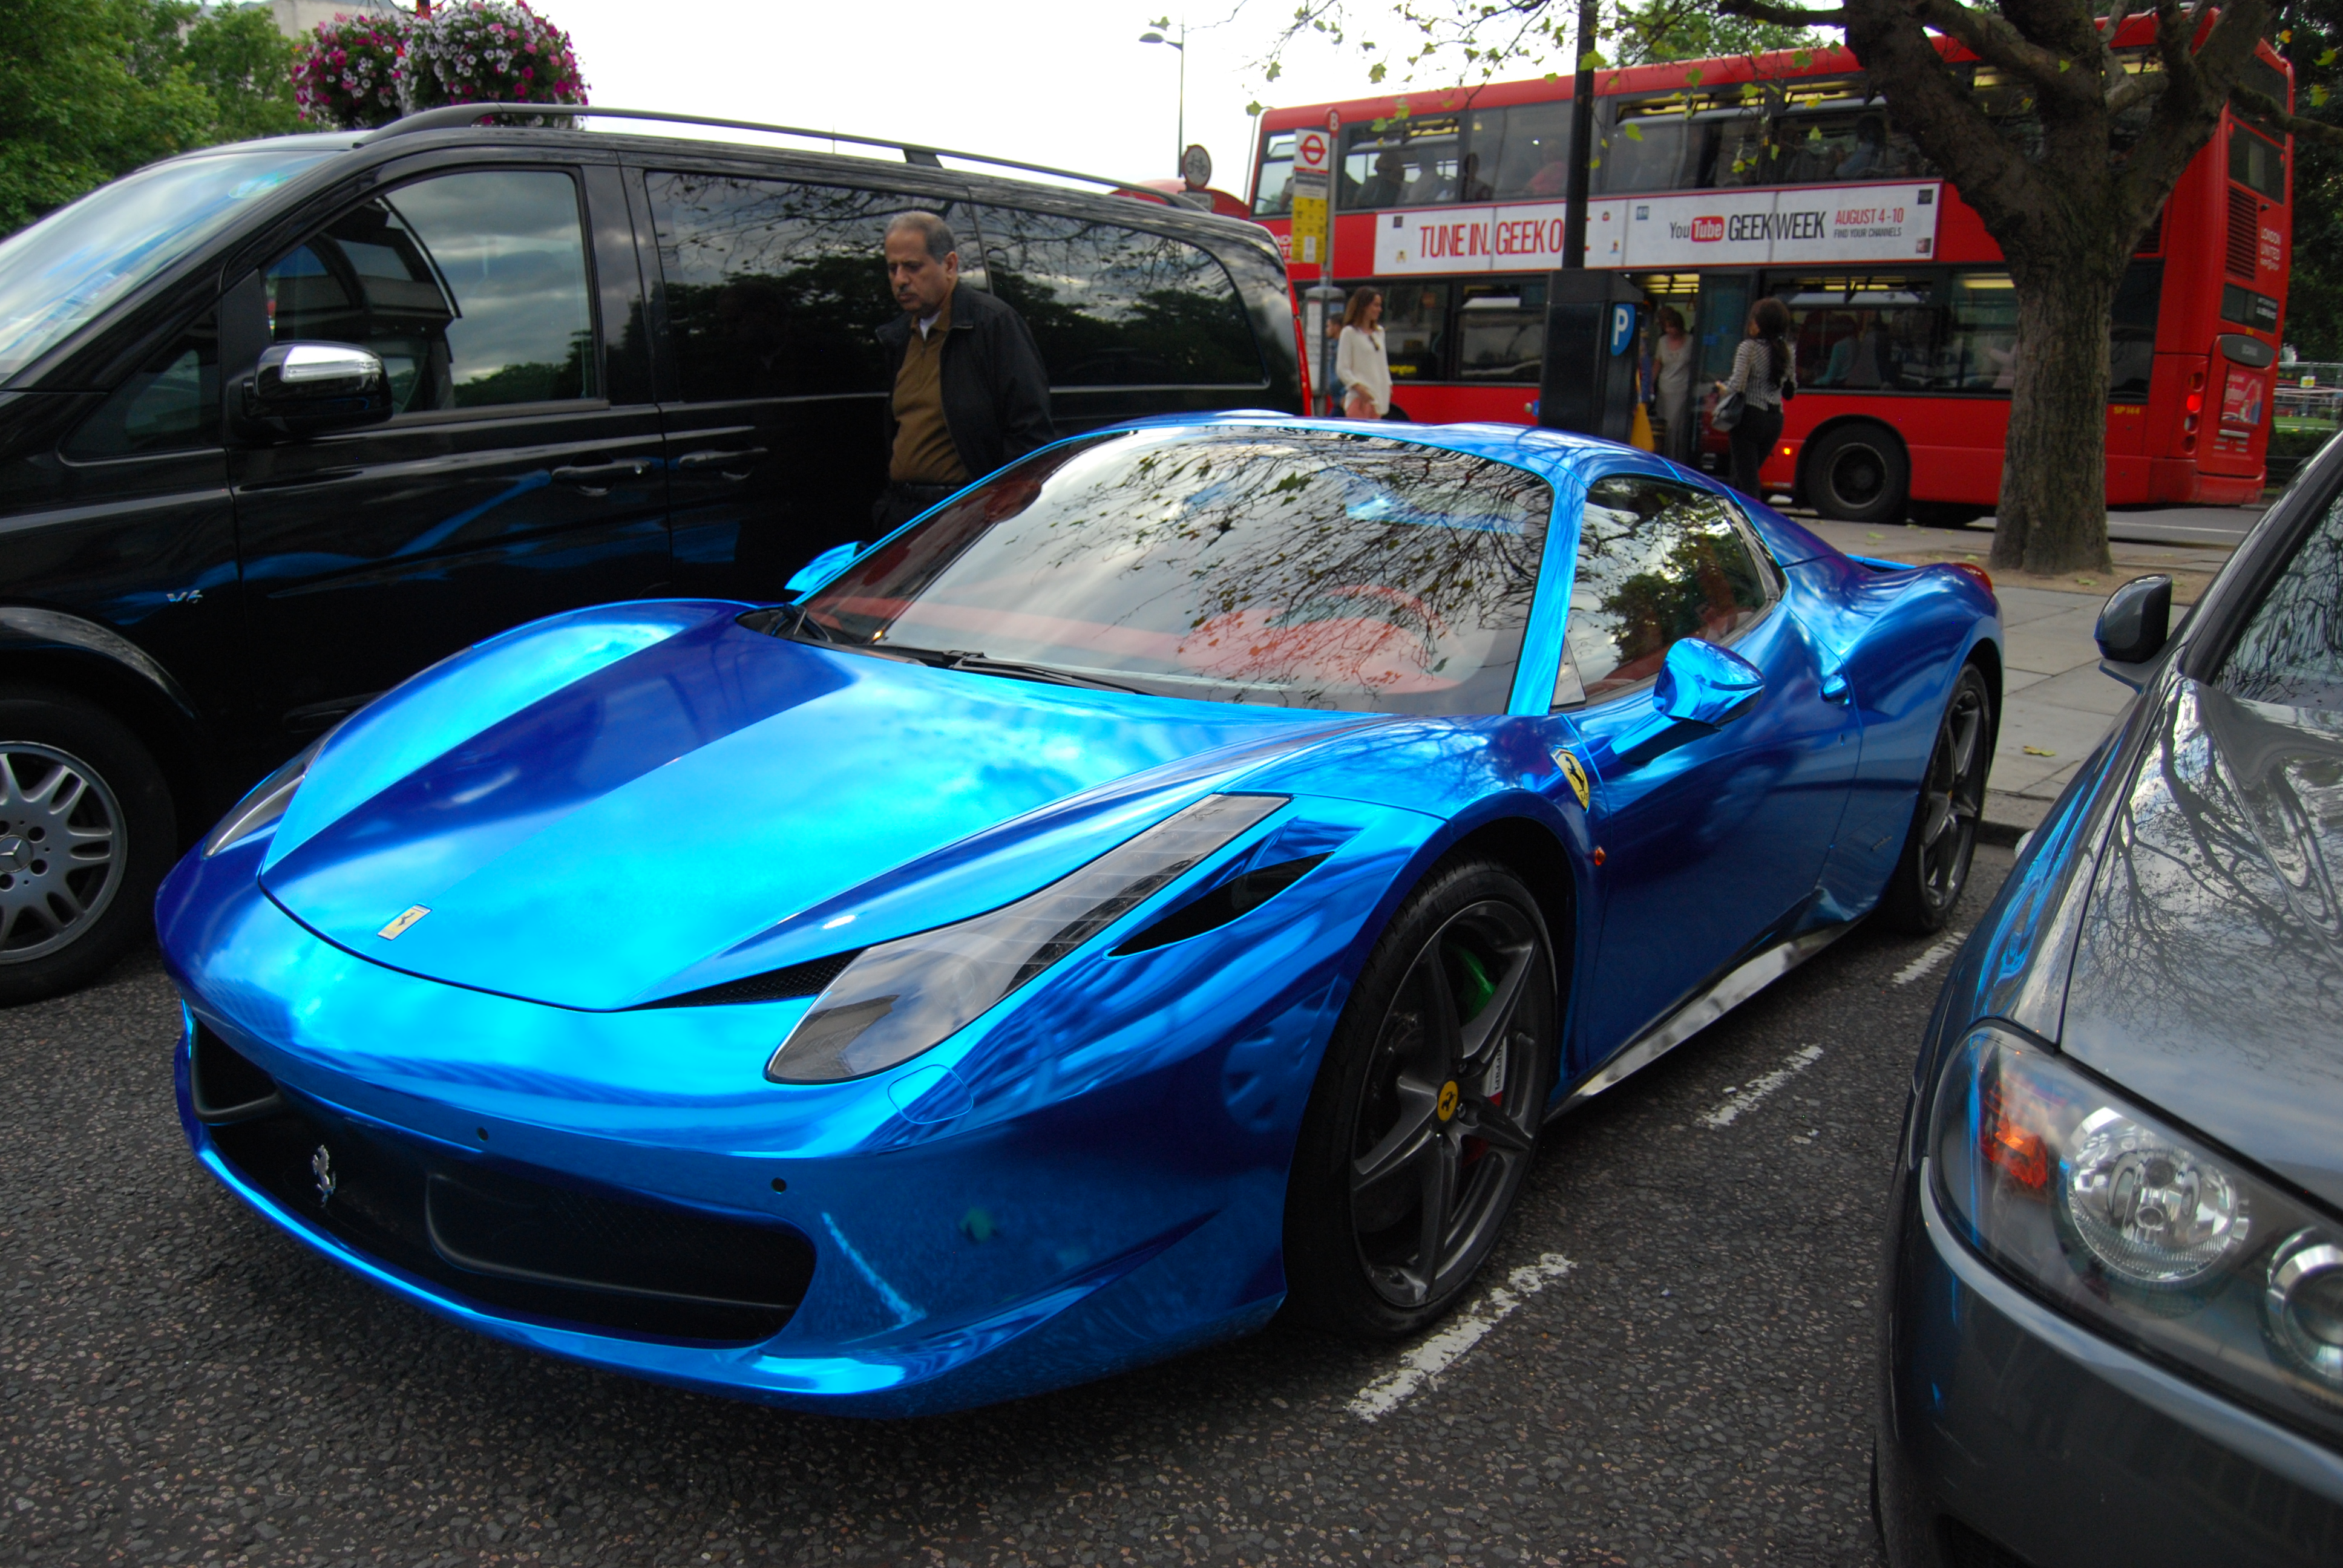 chrome blue ferrari 458sirhubris on deviantart